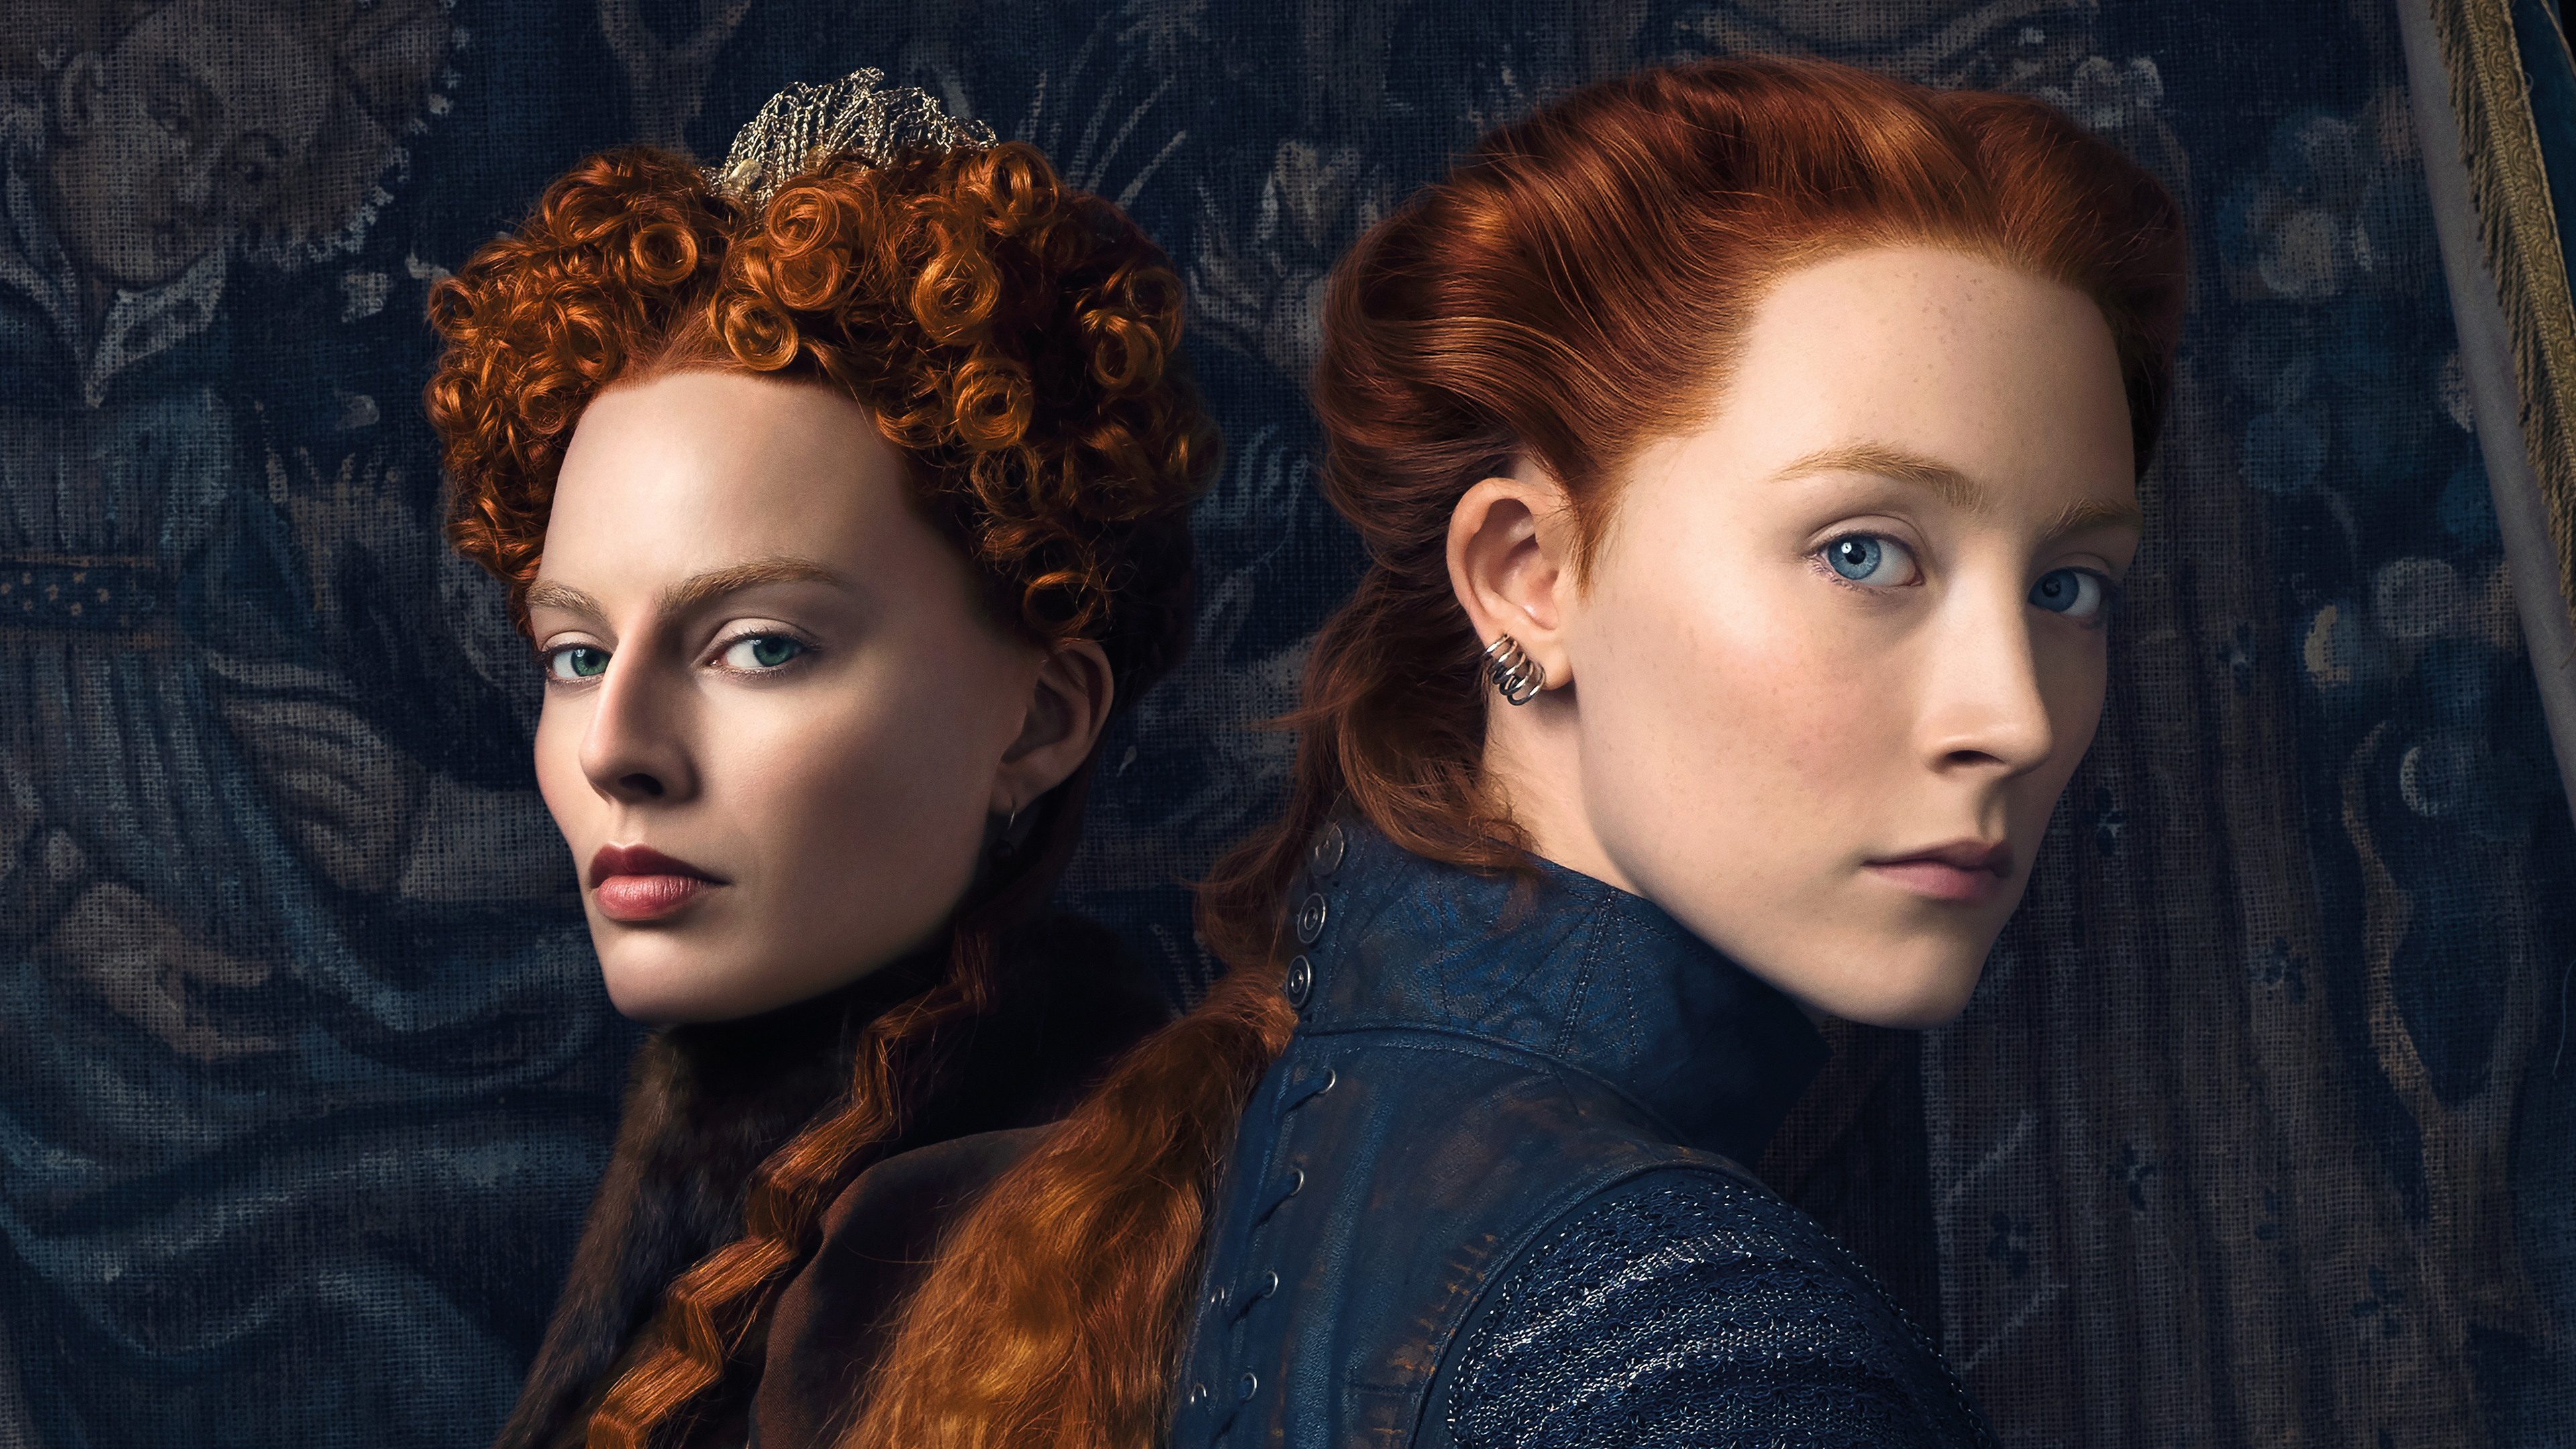 mary queen of scots 5k 1539979689 - Mary Queen Of Scots 5k - movies wallpapers, mary queen of scots wallpapers, margot robbie wallpapers, hd-wallpapers, 5k wallpapers, 4k-wallpapers, 2018-movies-wallpapers